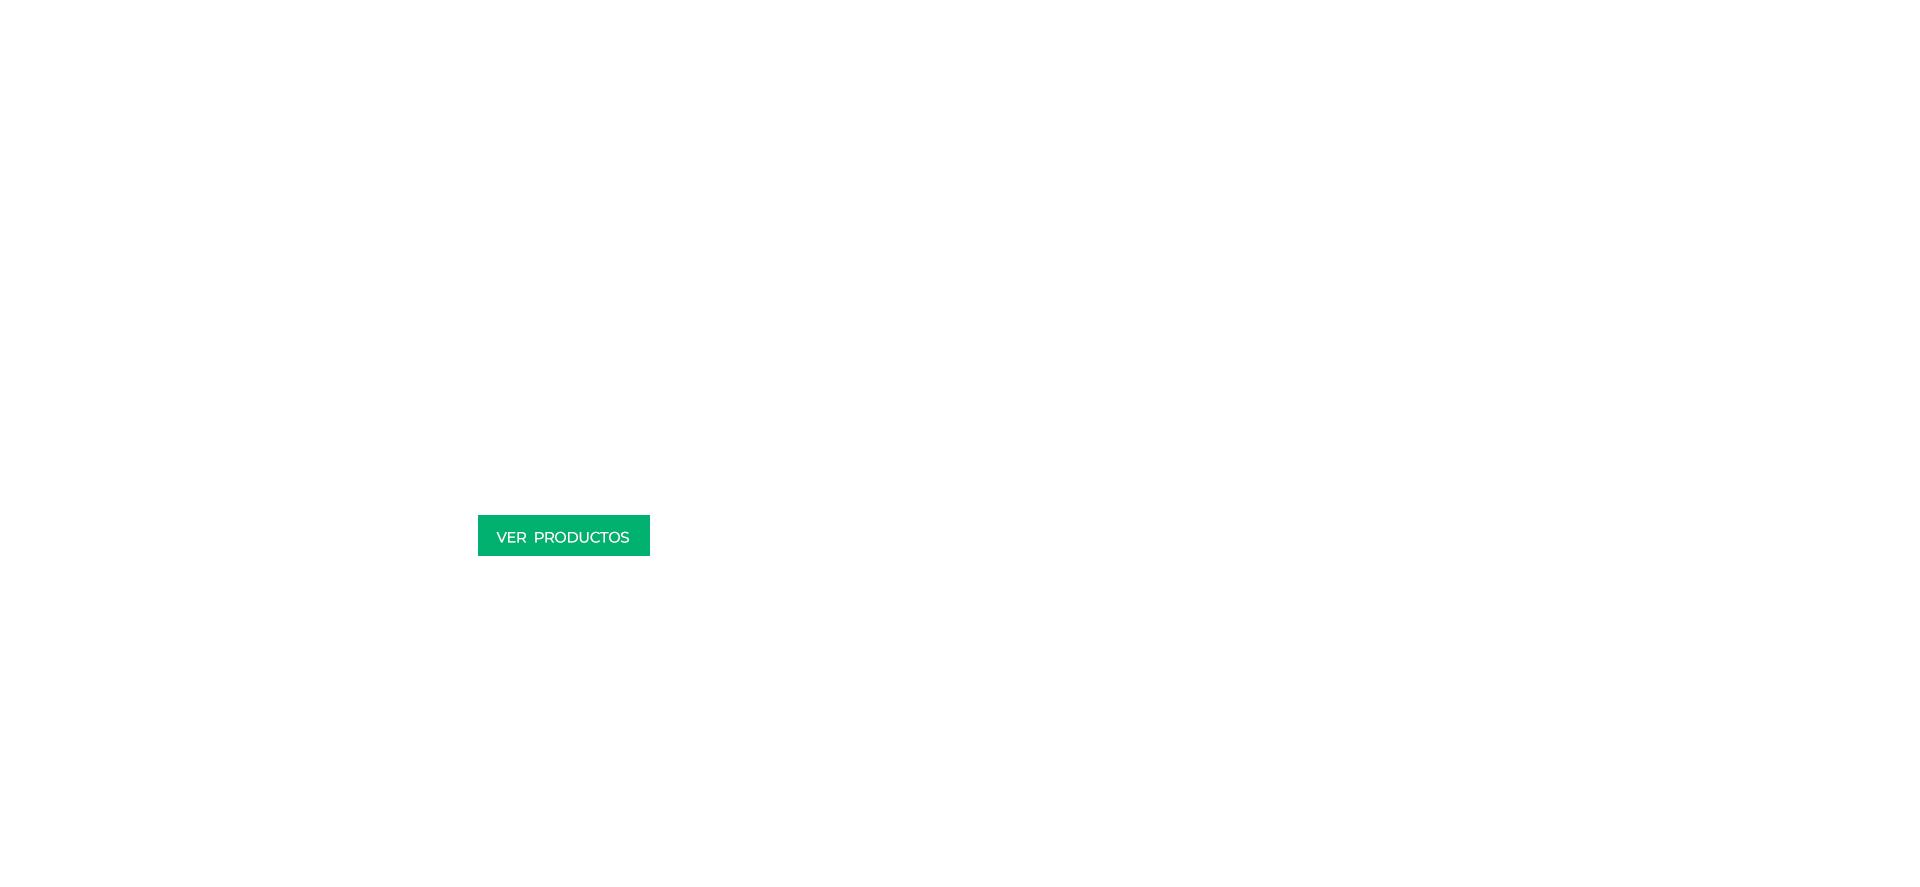 04-web-slider-trabajos-personalizados-TXT-new.png